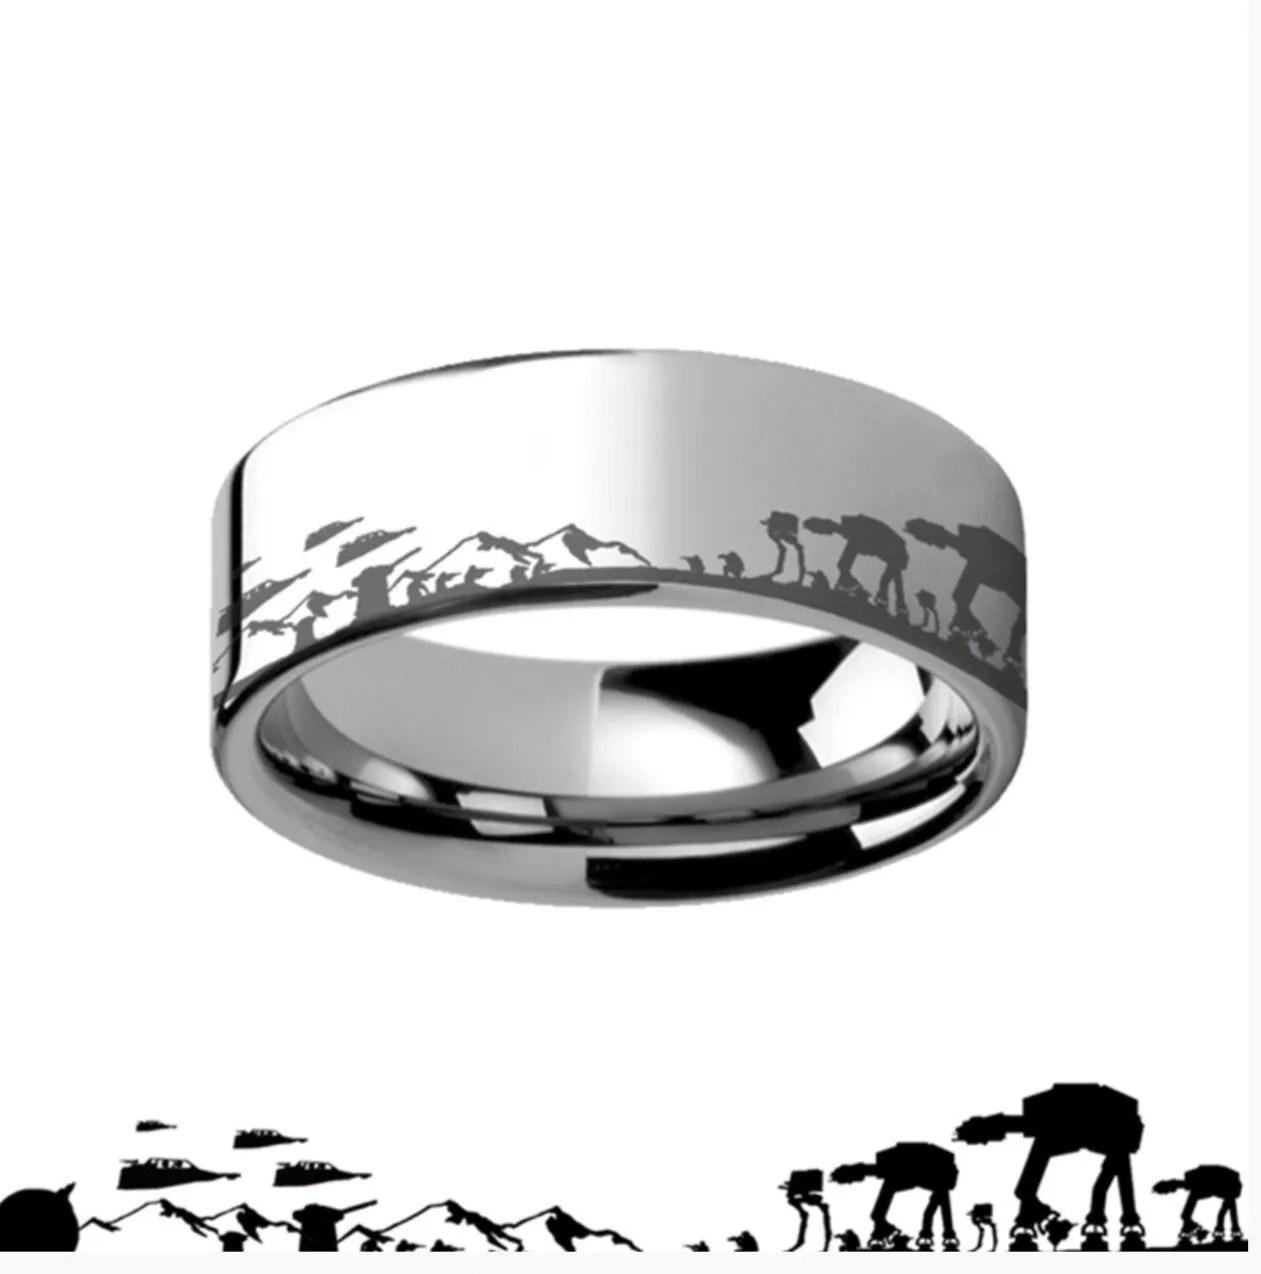 star wars wedding ring star wars wedding bands Star wars wedding ring Wedding Ring Star Wars